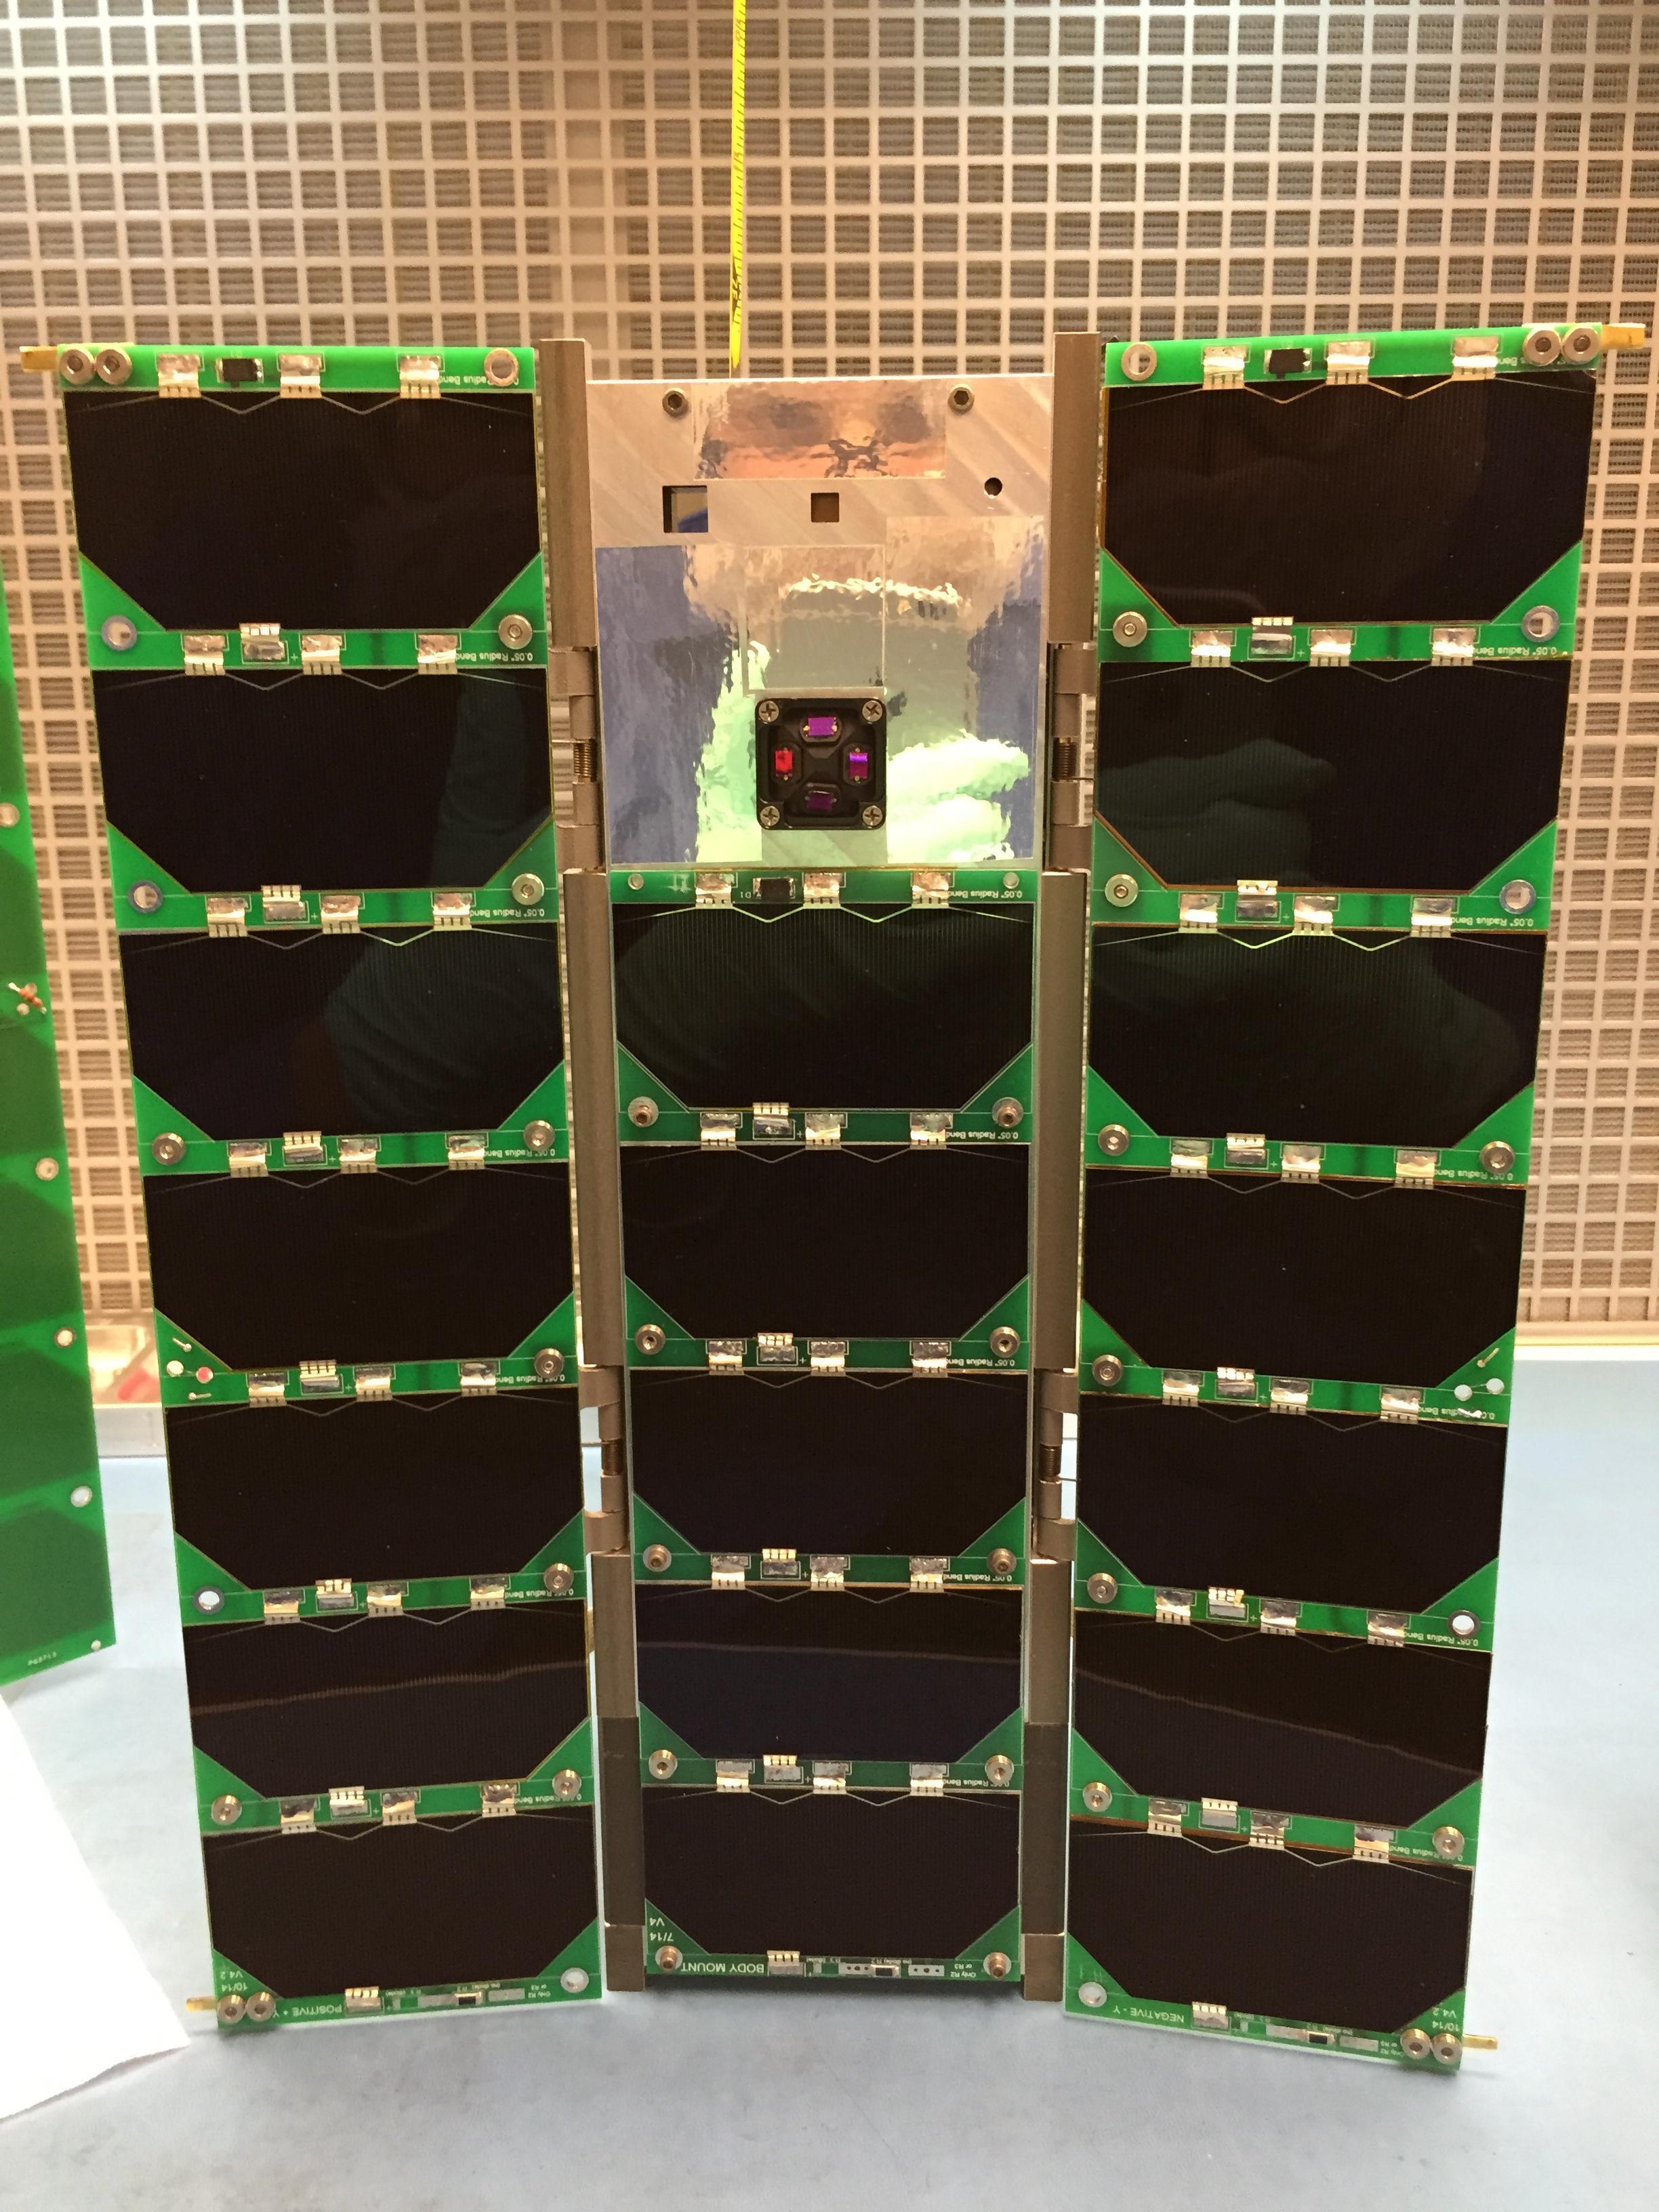 Nasa Nanoracks Miniature X Ray Solar Spectrometer Cubesat